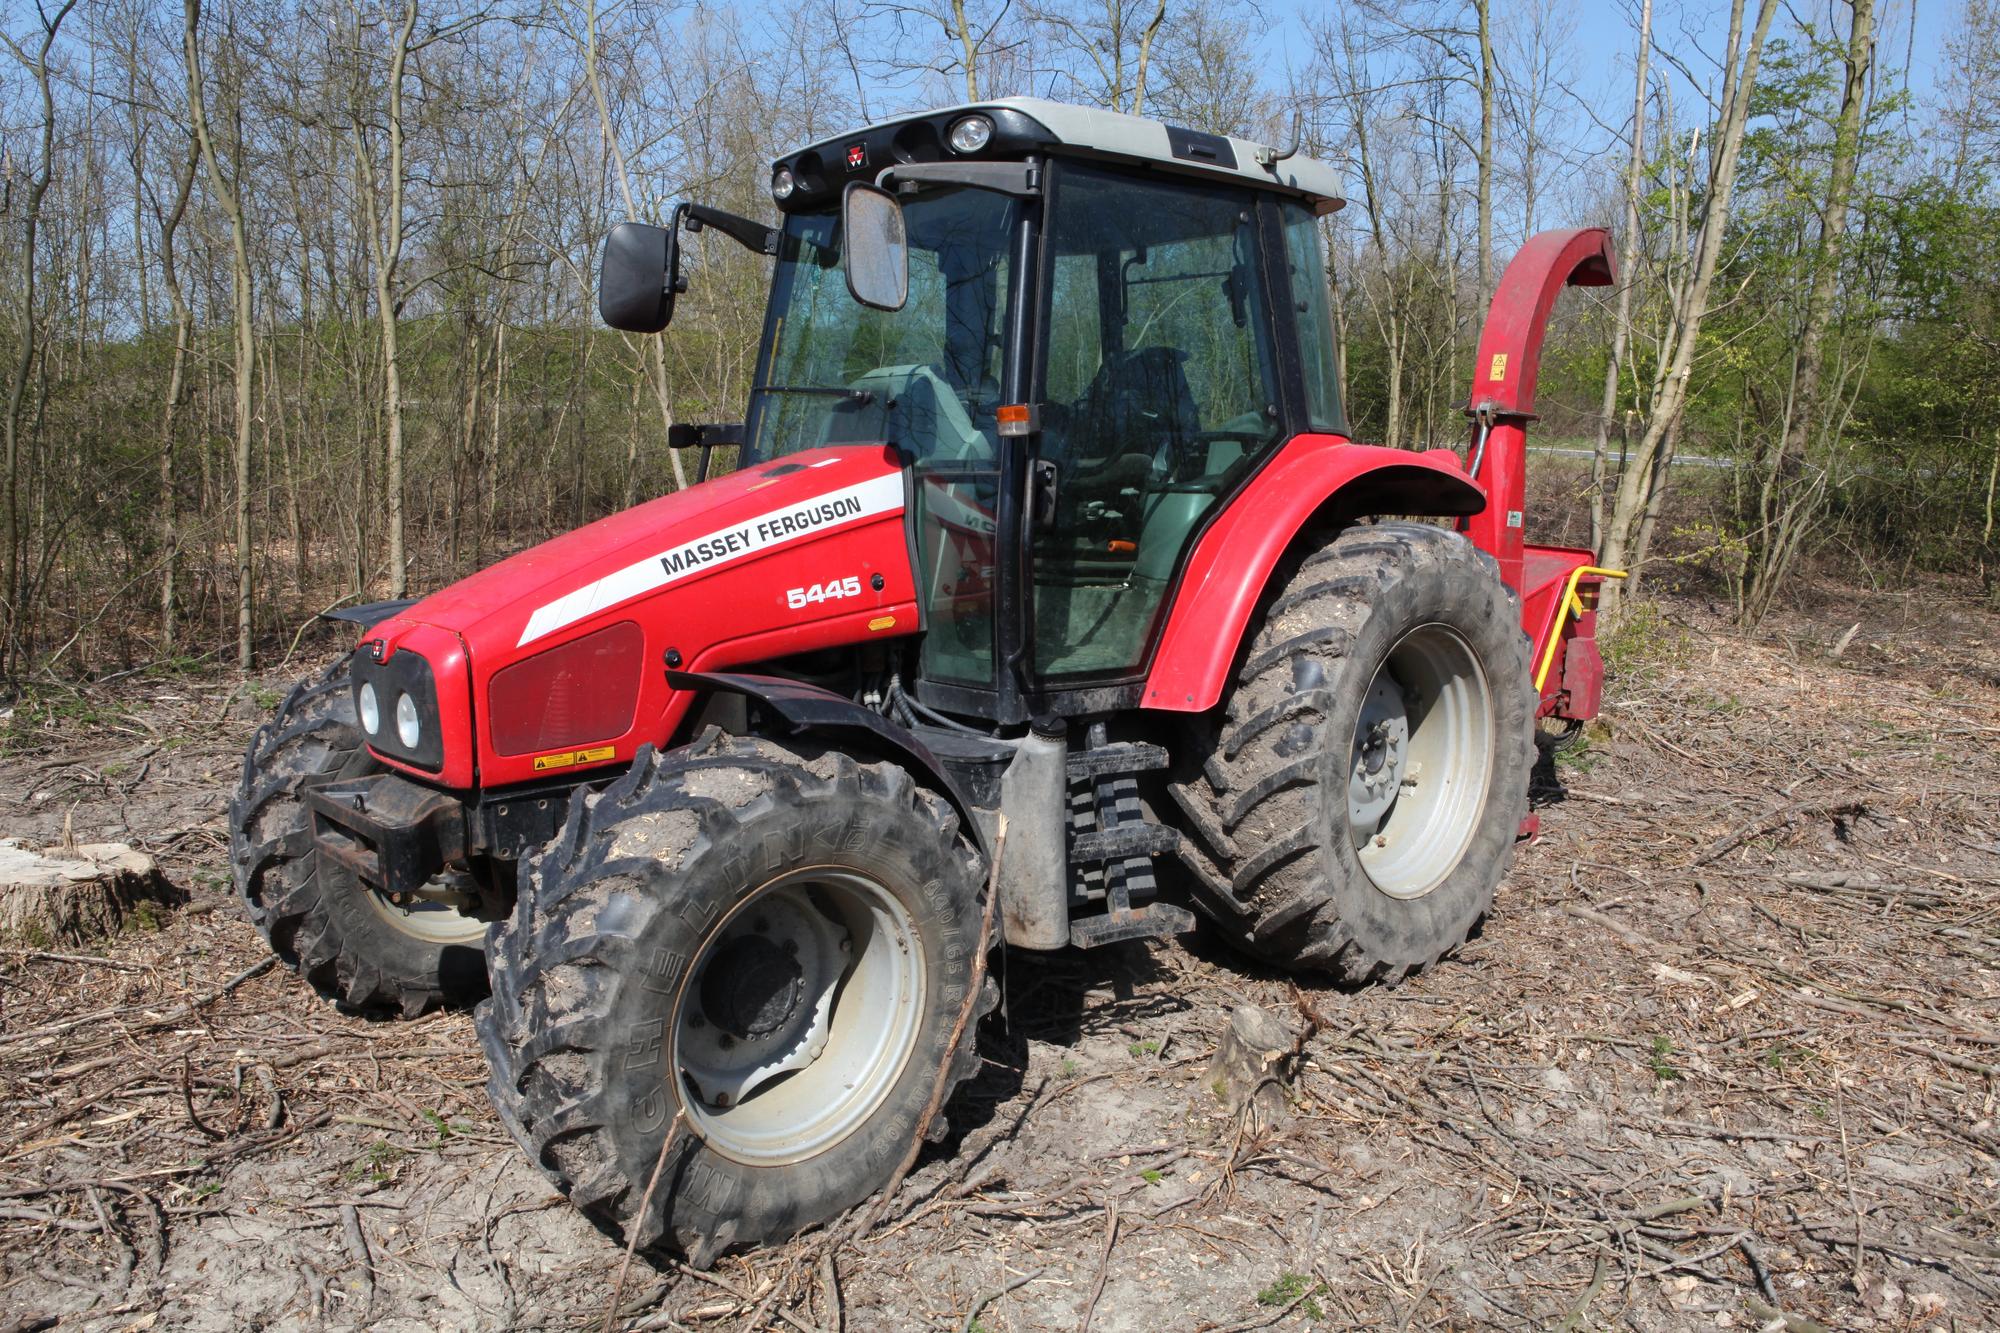 Massey Ferguson 5400 series   Tractor & Construction Plant Wiki   FANDOM  powered by Wikia